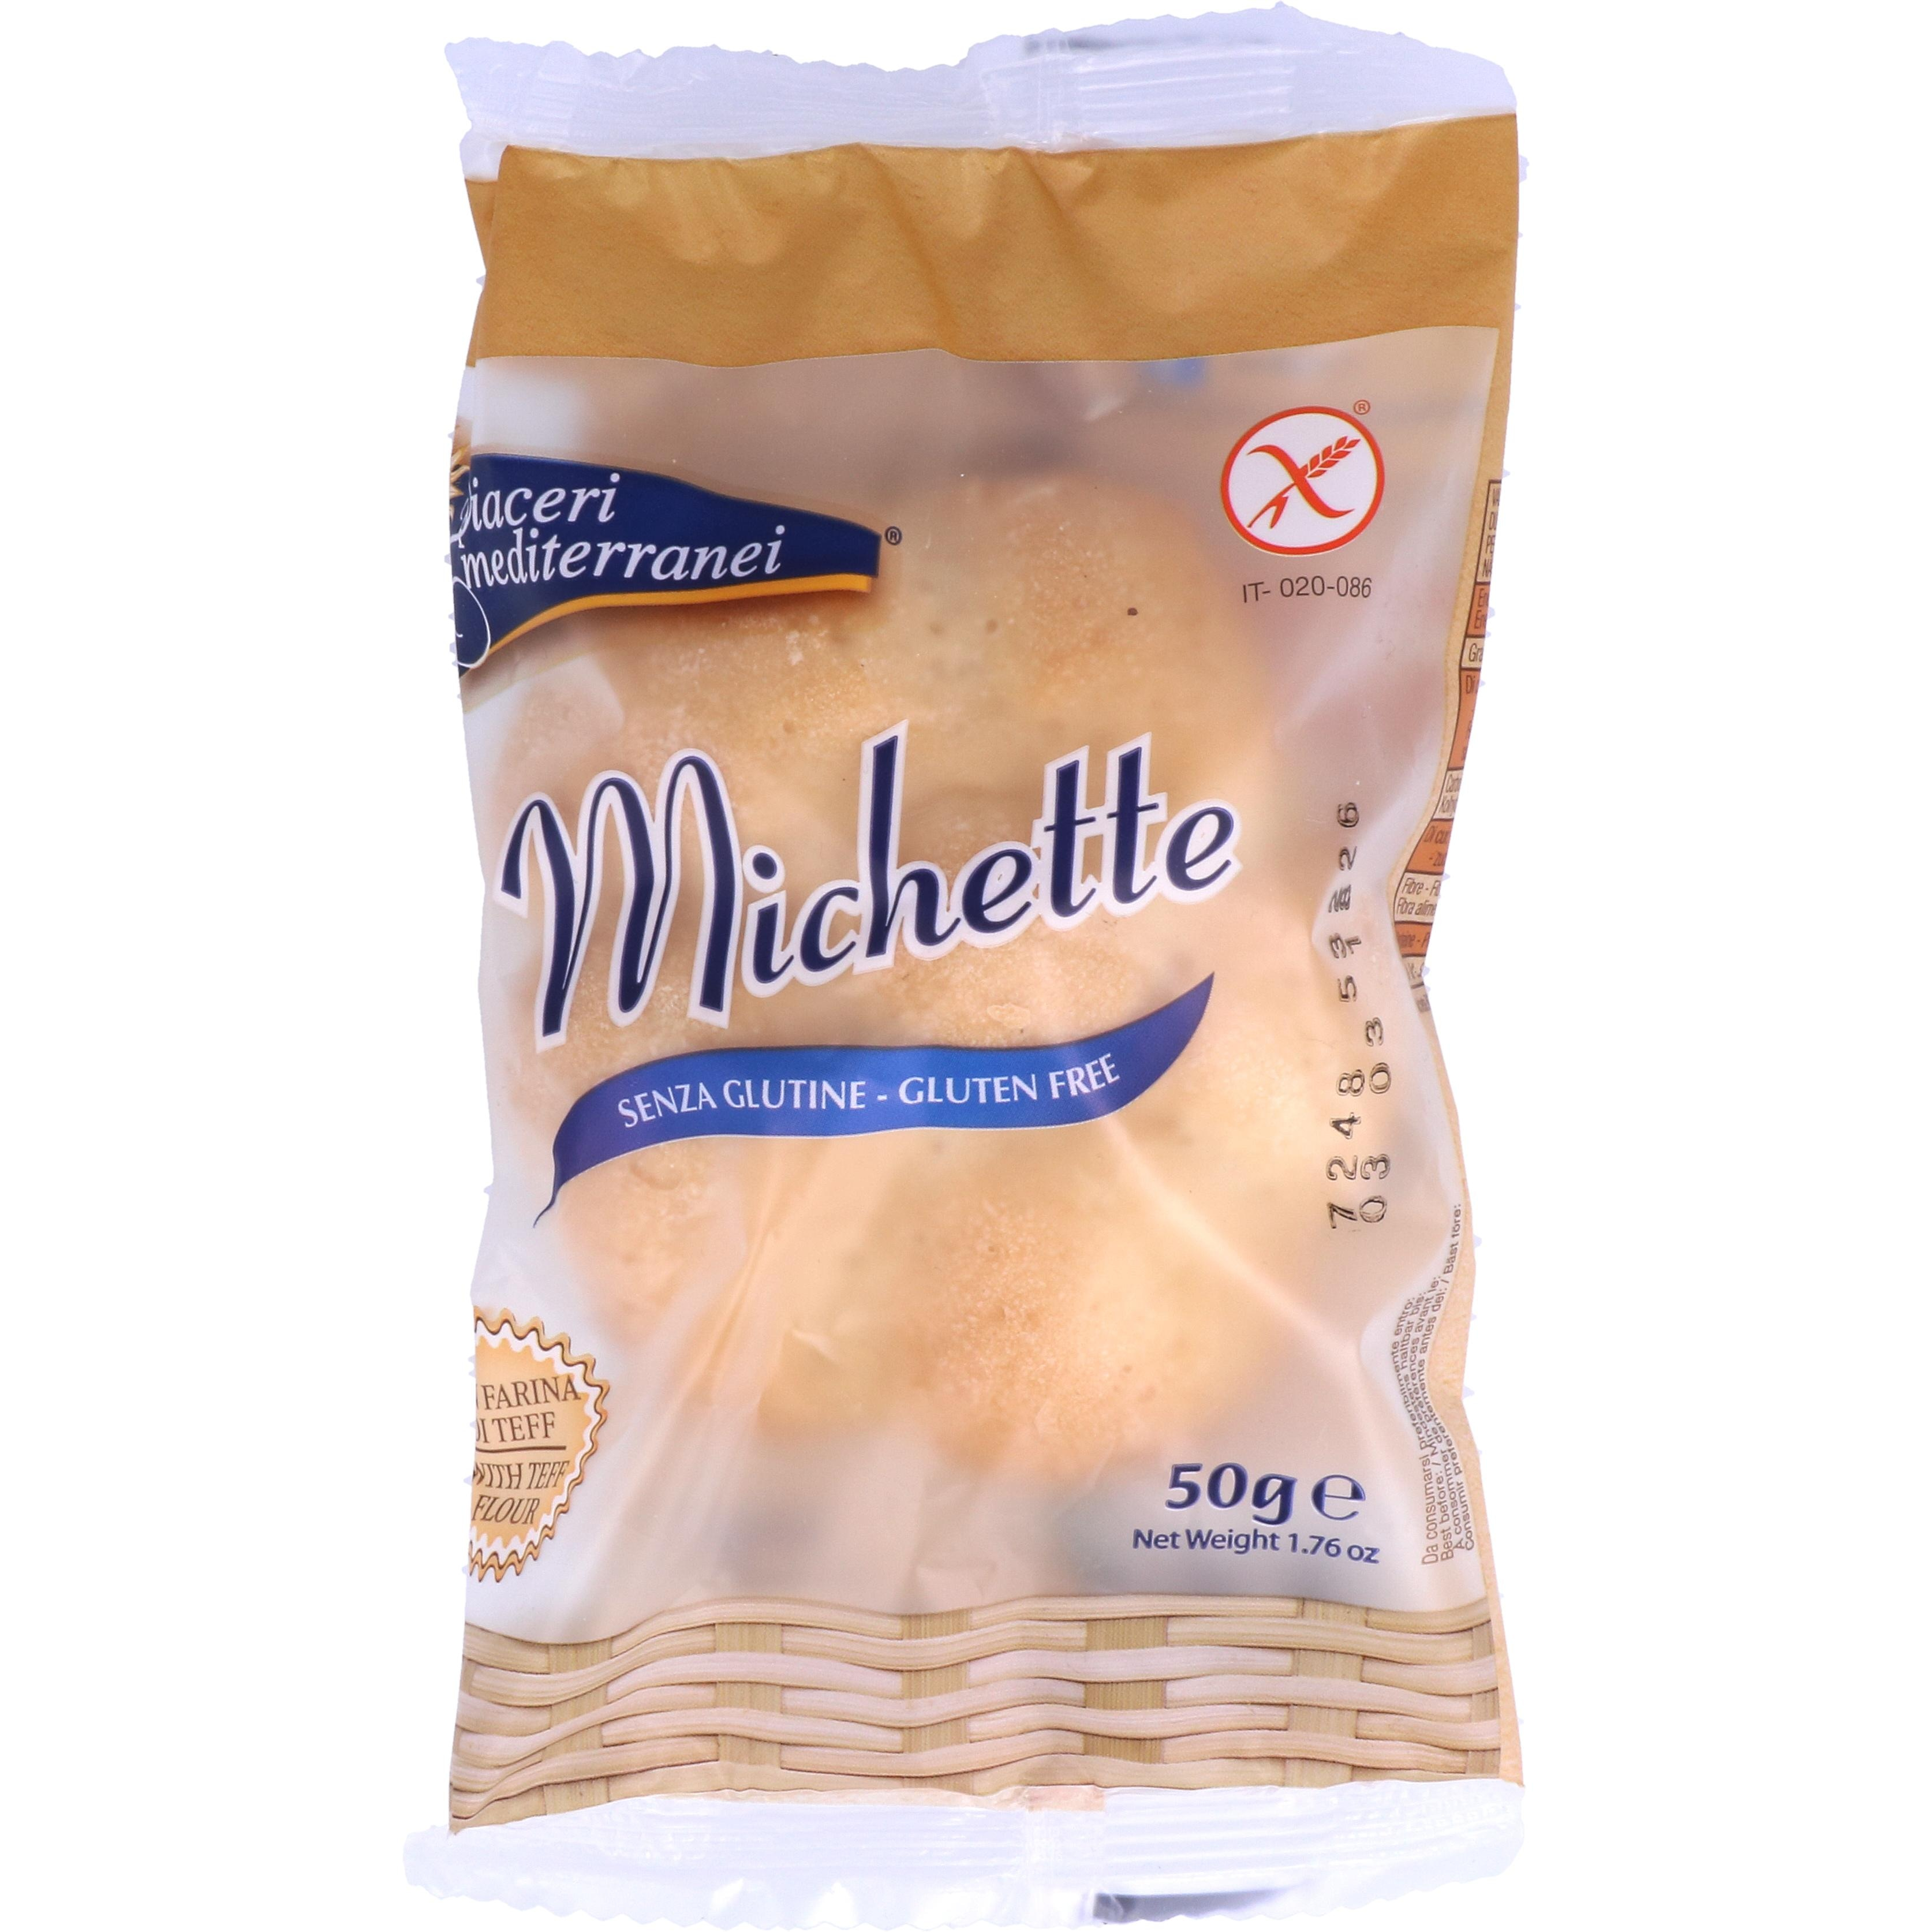 Piaceri Mediterranei Michette Brötchen 50g